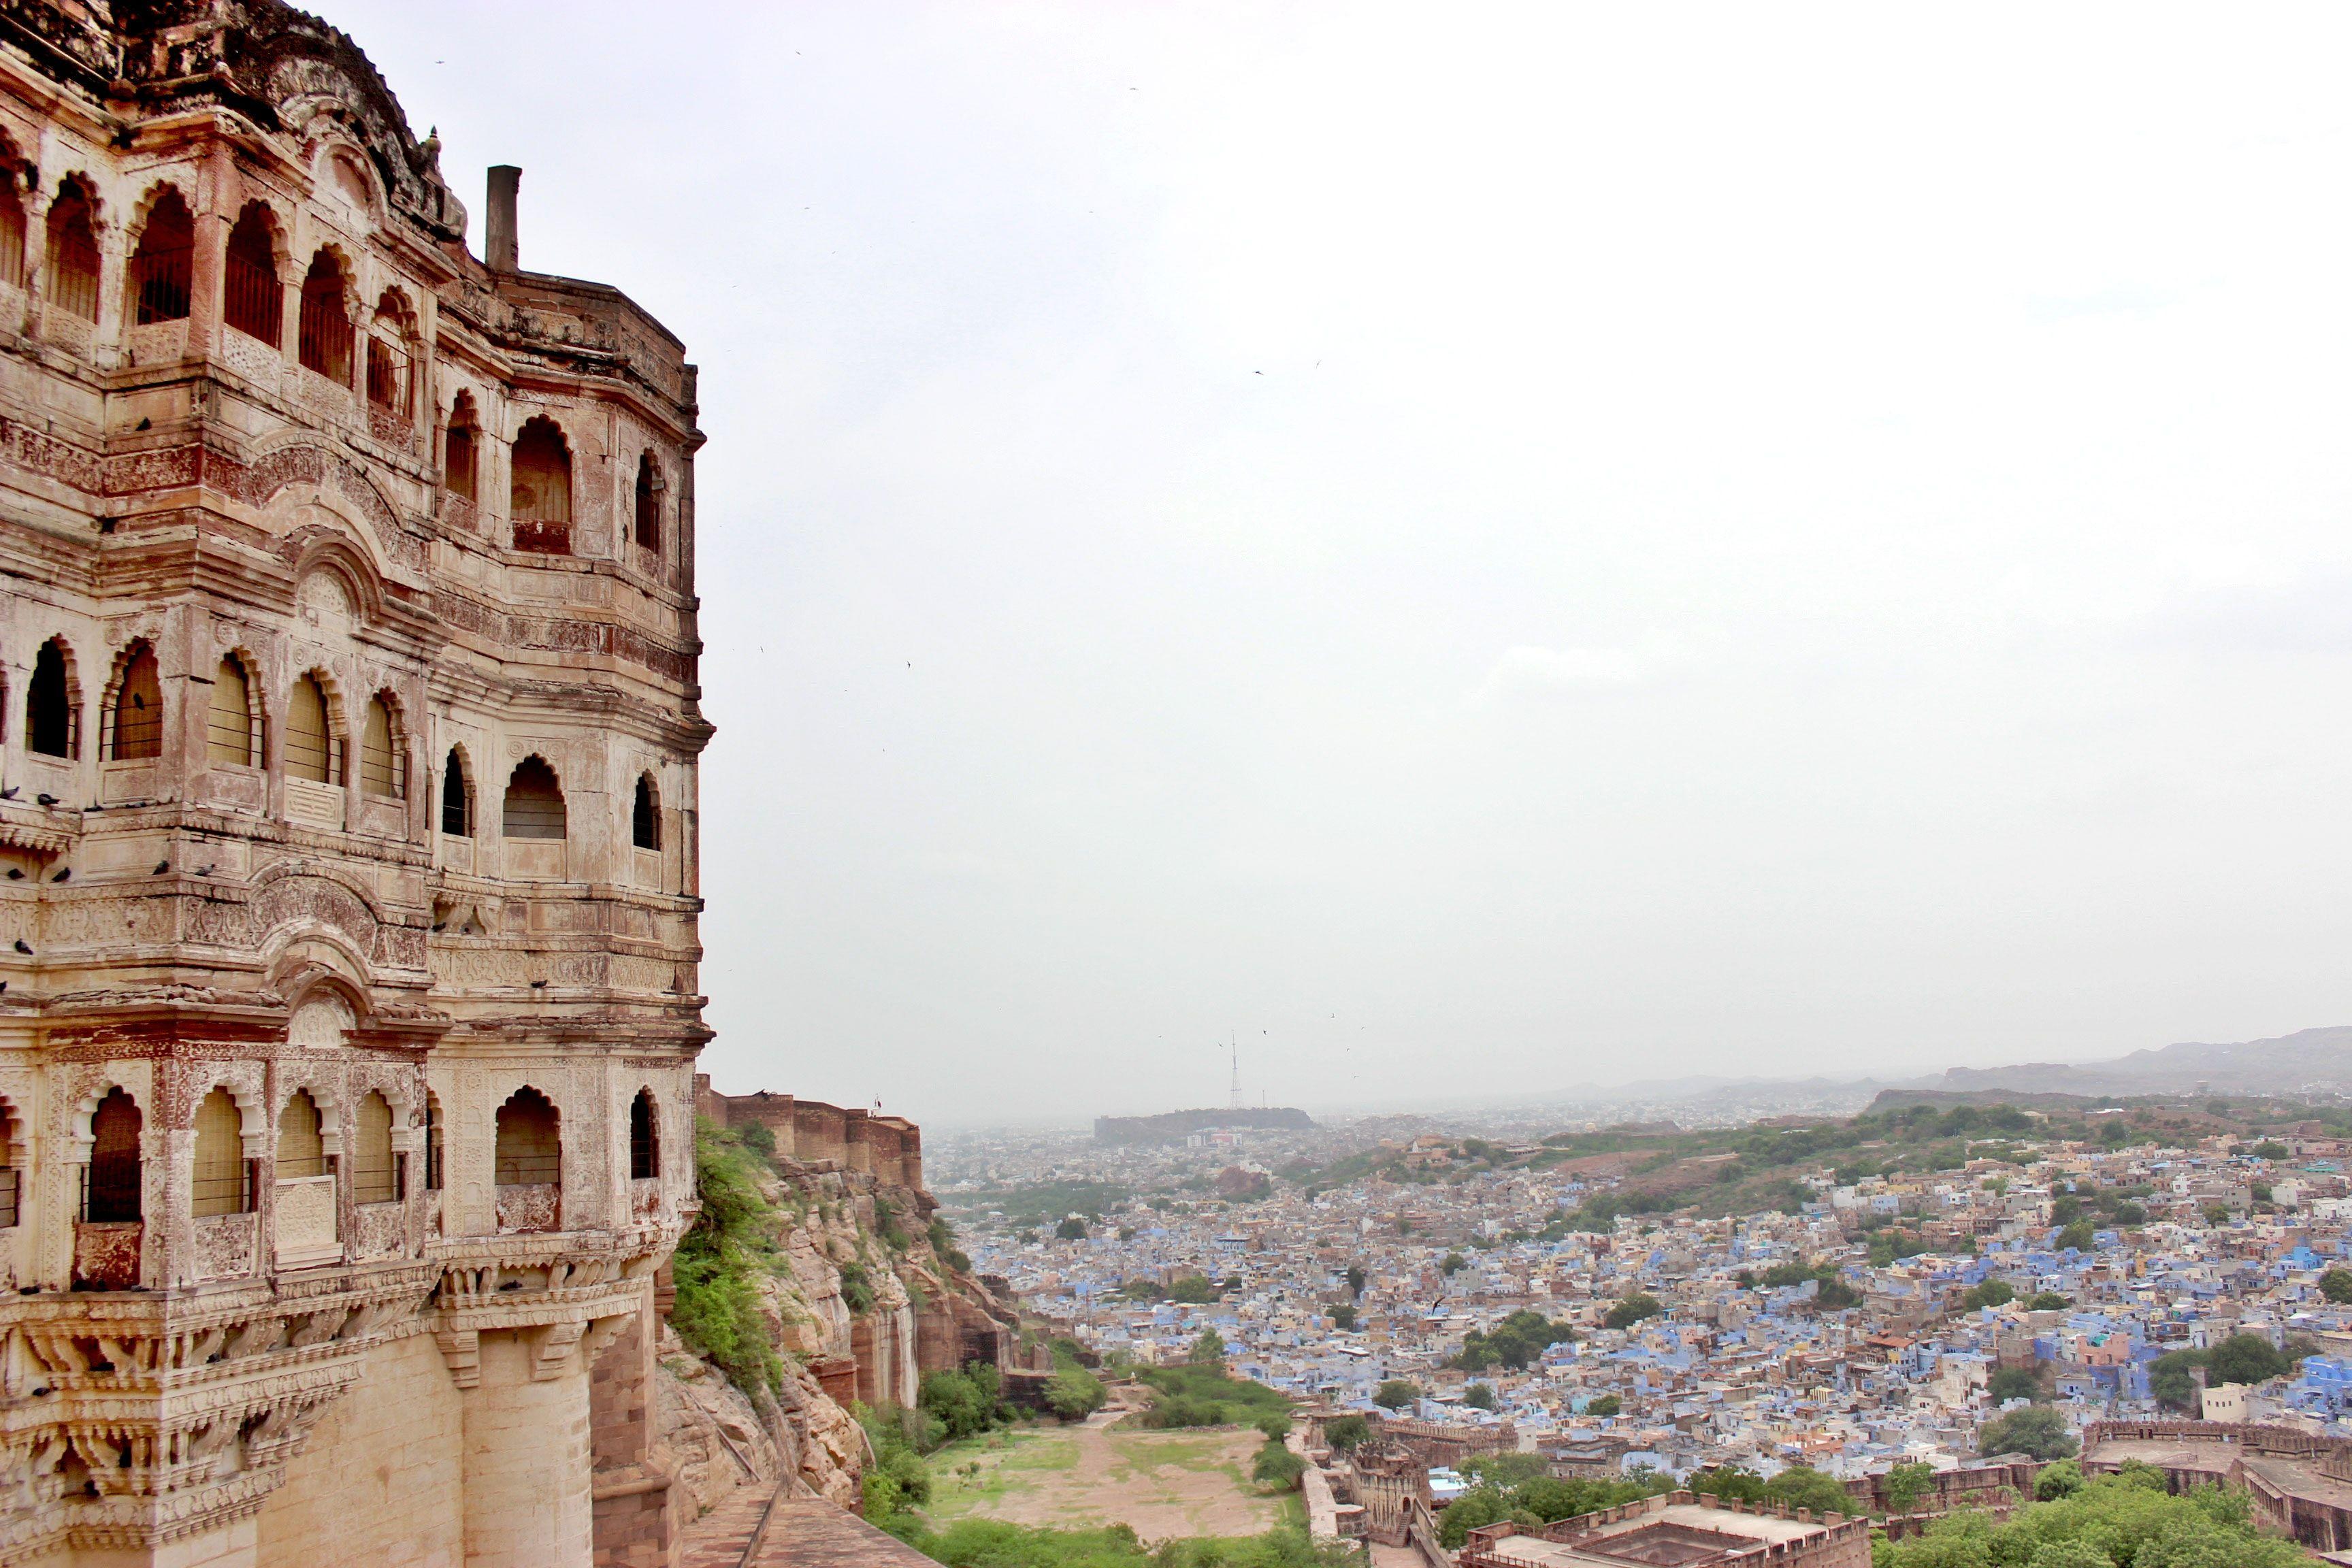 Mehrangarh #Fort #Jodhpur #Rajasthan City view from